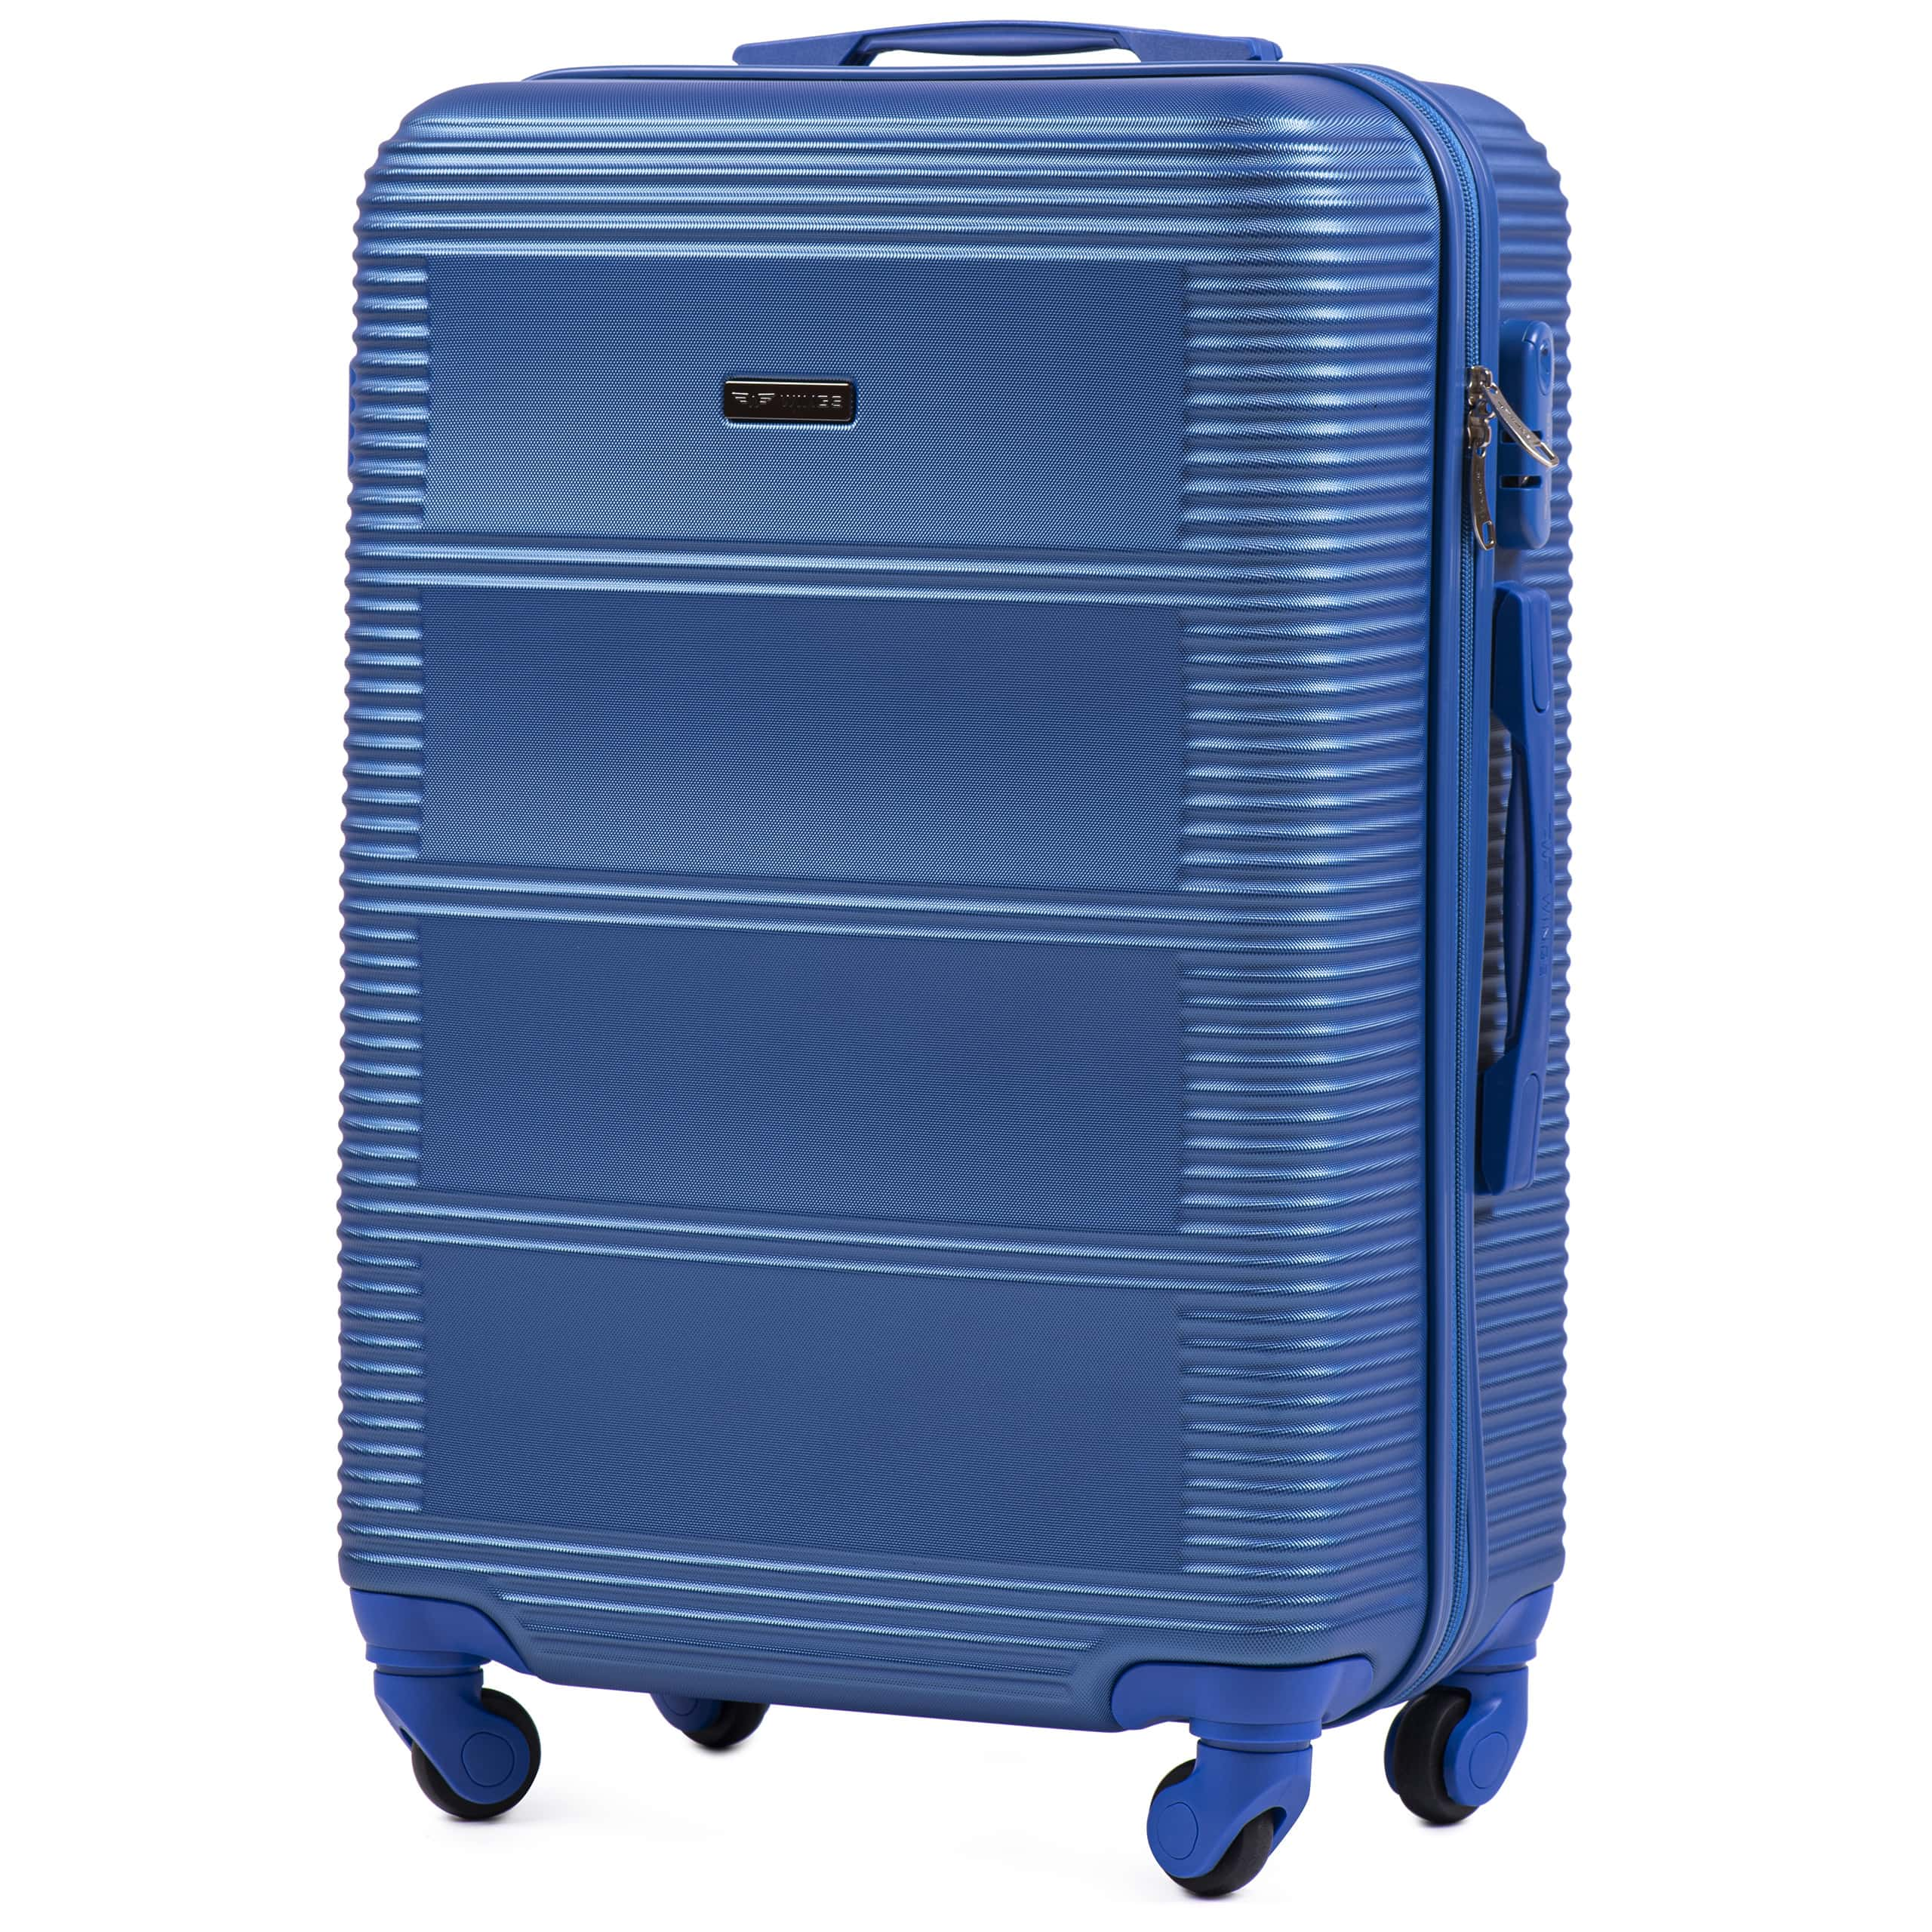 Чемодан Ударостойкий ! Средний из поликарбоната WINGS K203 M ELECTRO Для багажа ,до 18 кг